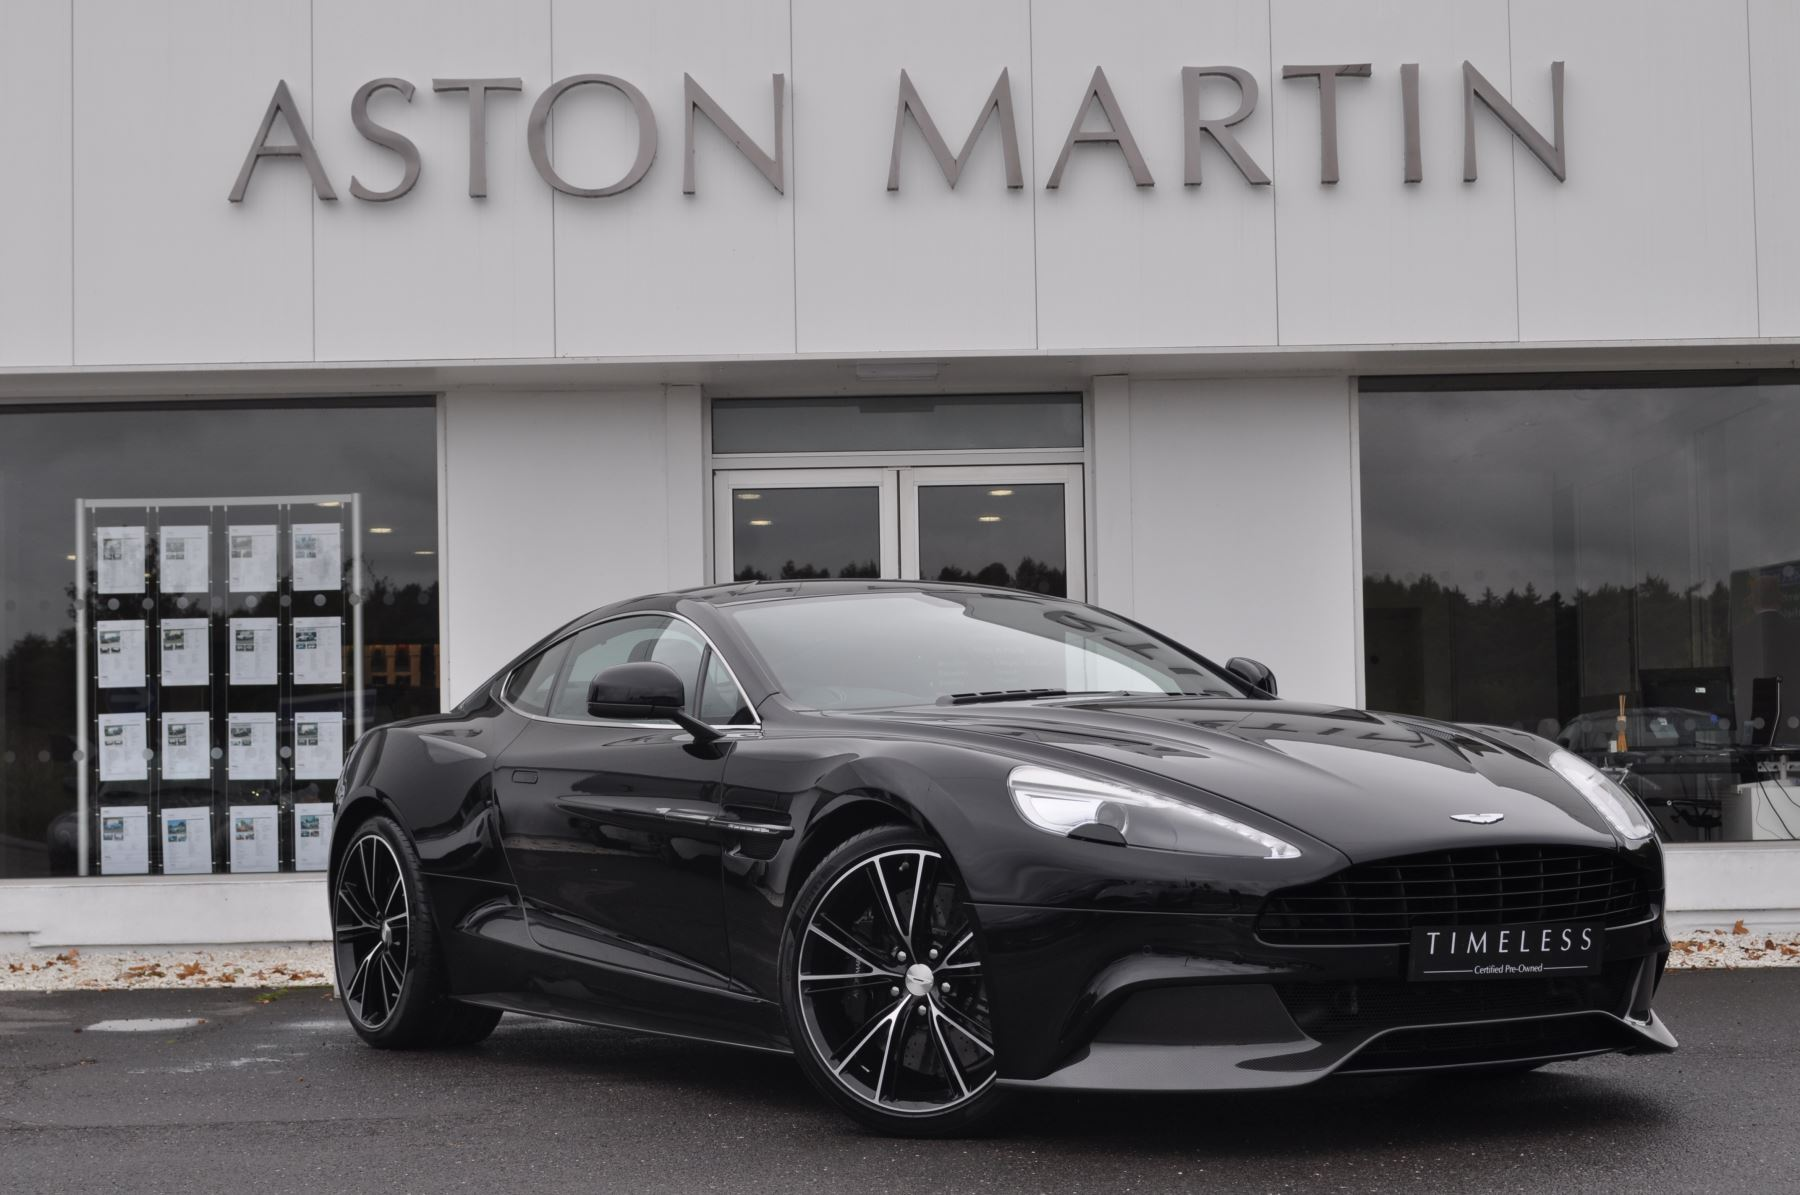 Aston Martin Vanquish V12 2+2 2dr Touchtronic 5.9 Automatic Coupe (2014) image